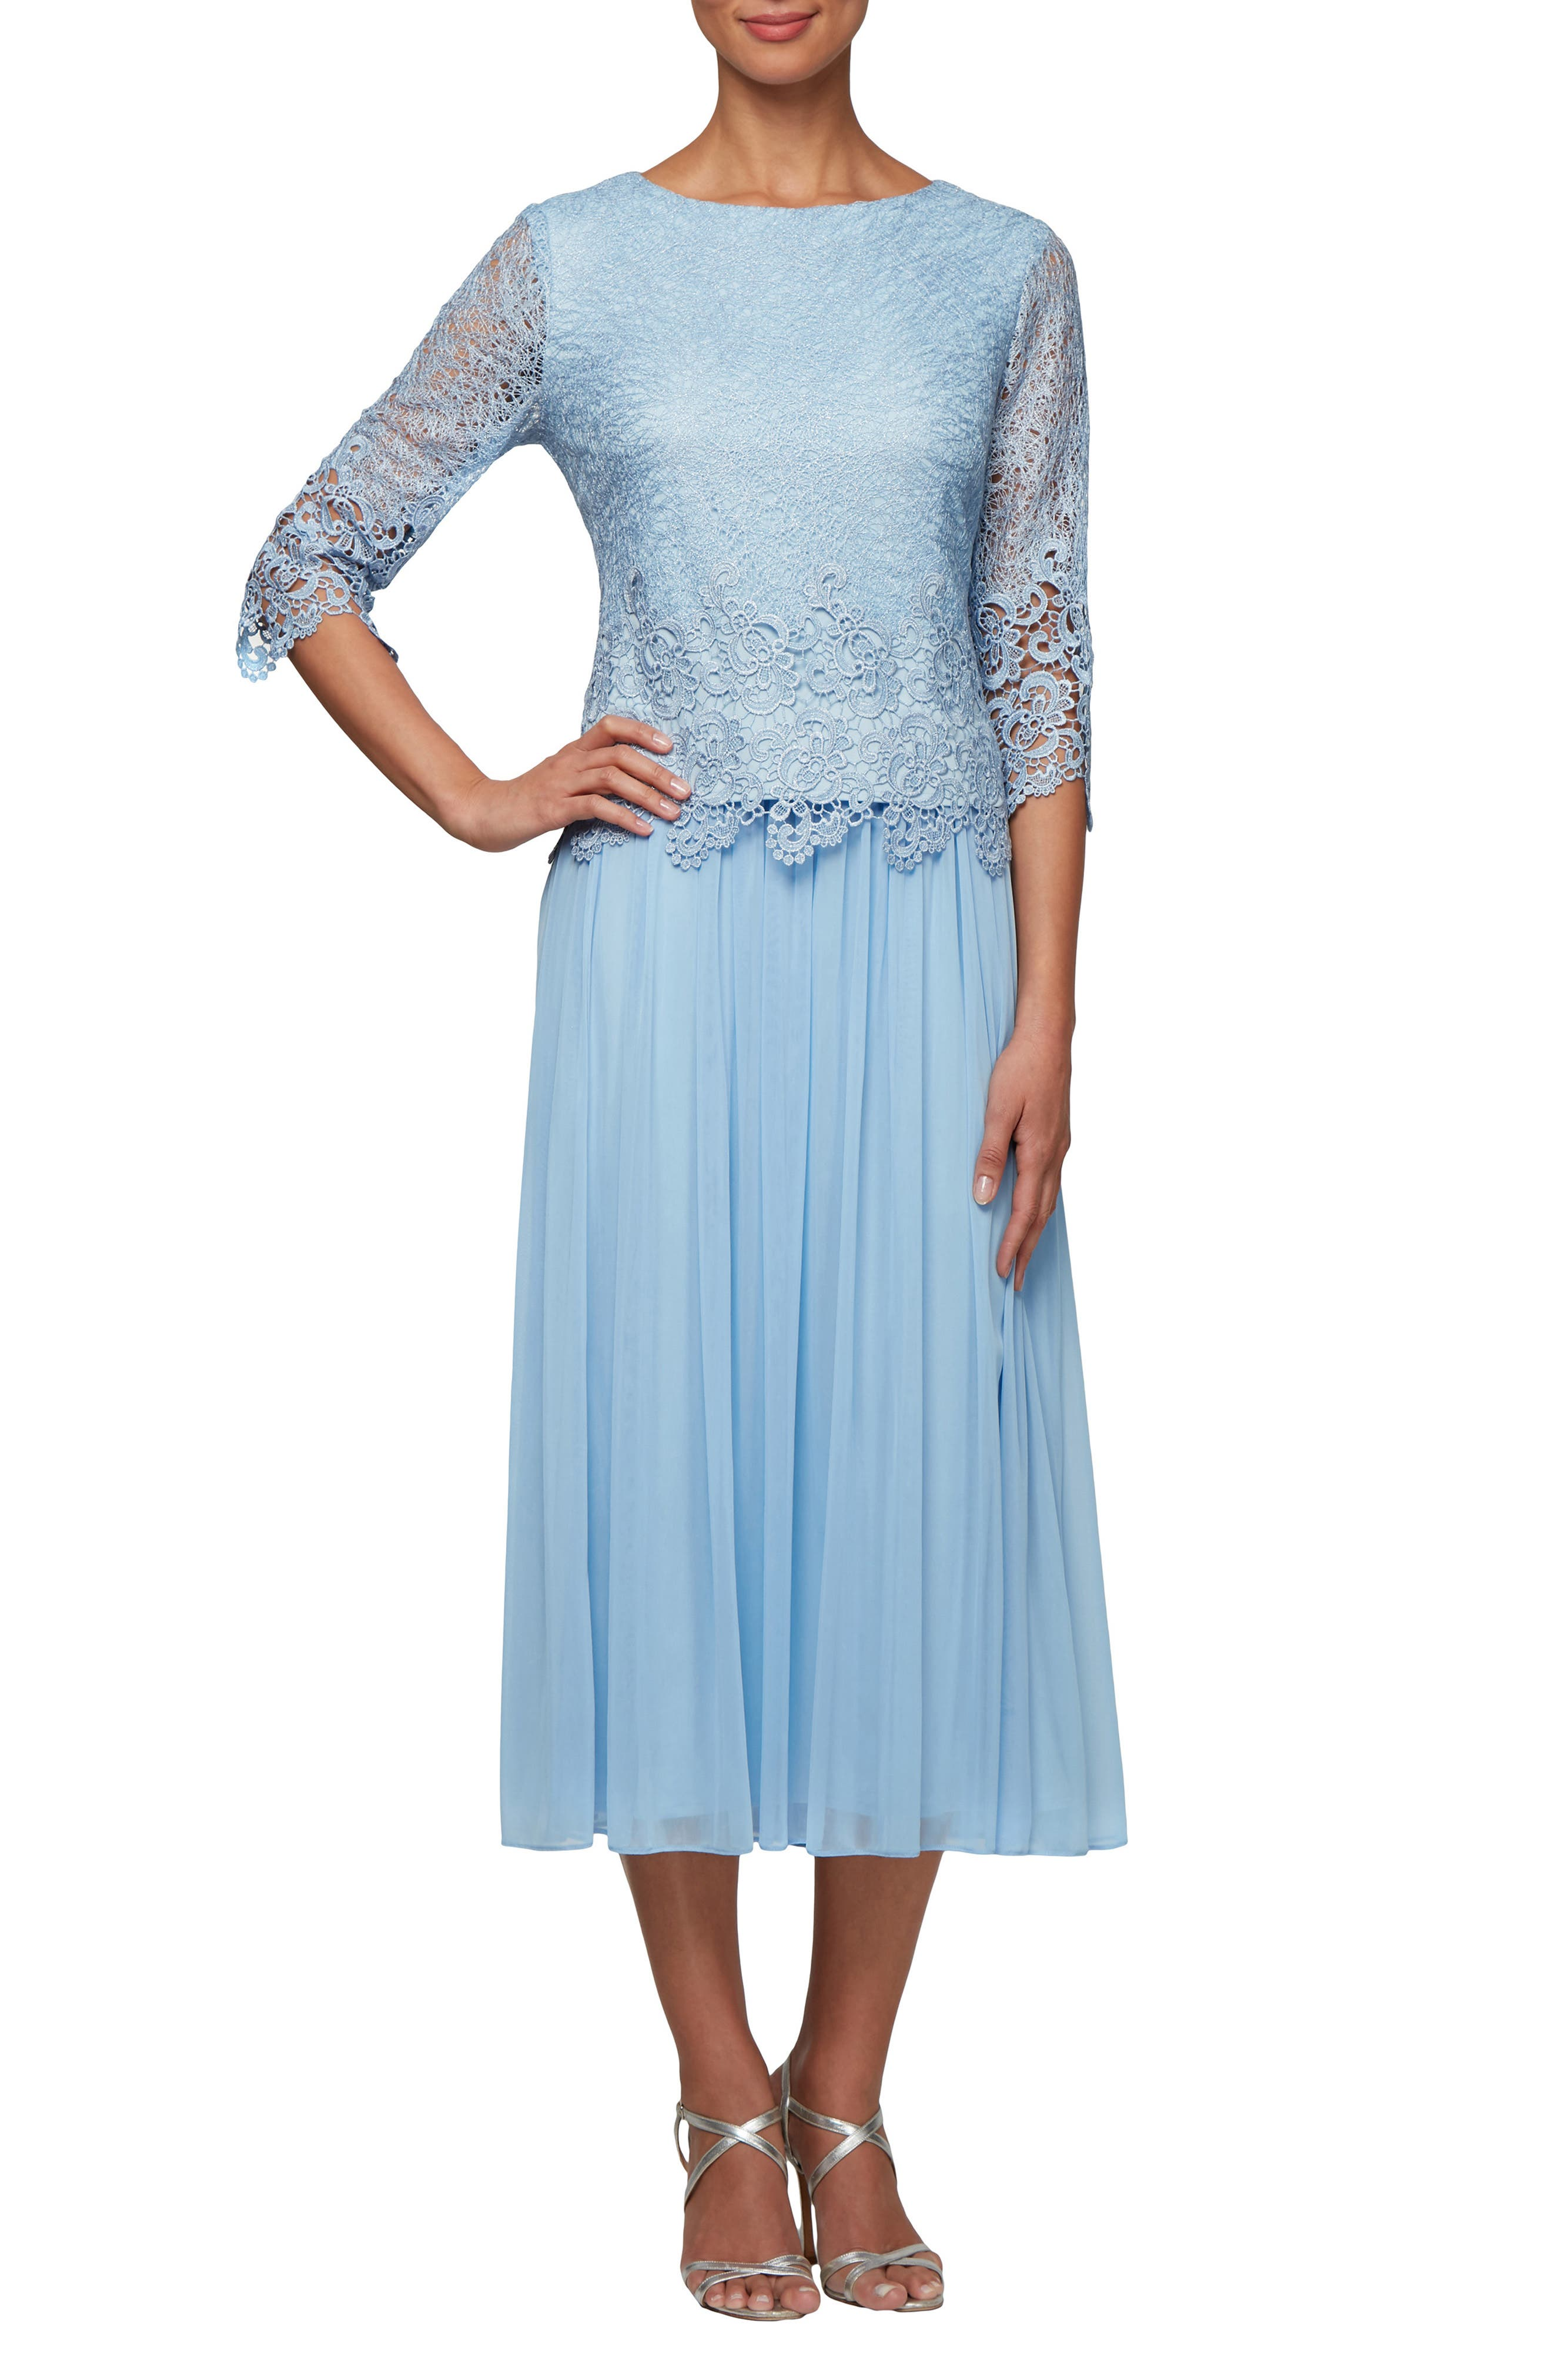 Petite Alex Evenings Lace & Tulle Popover Dress, Blue